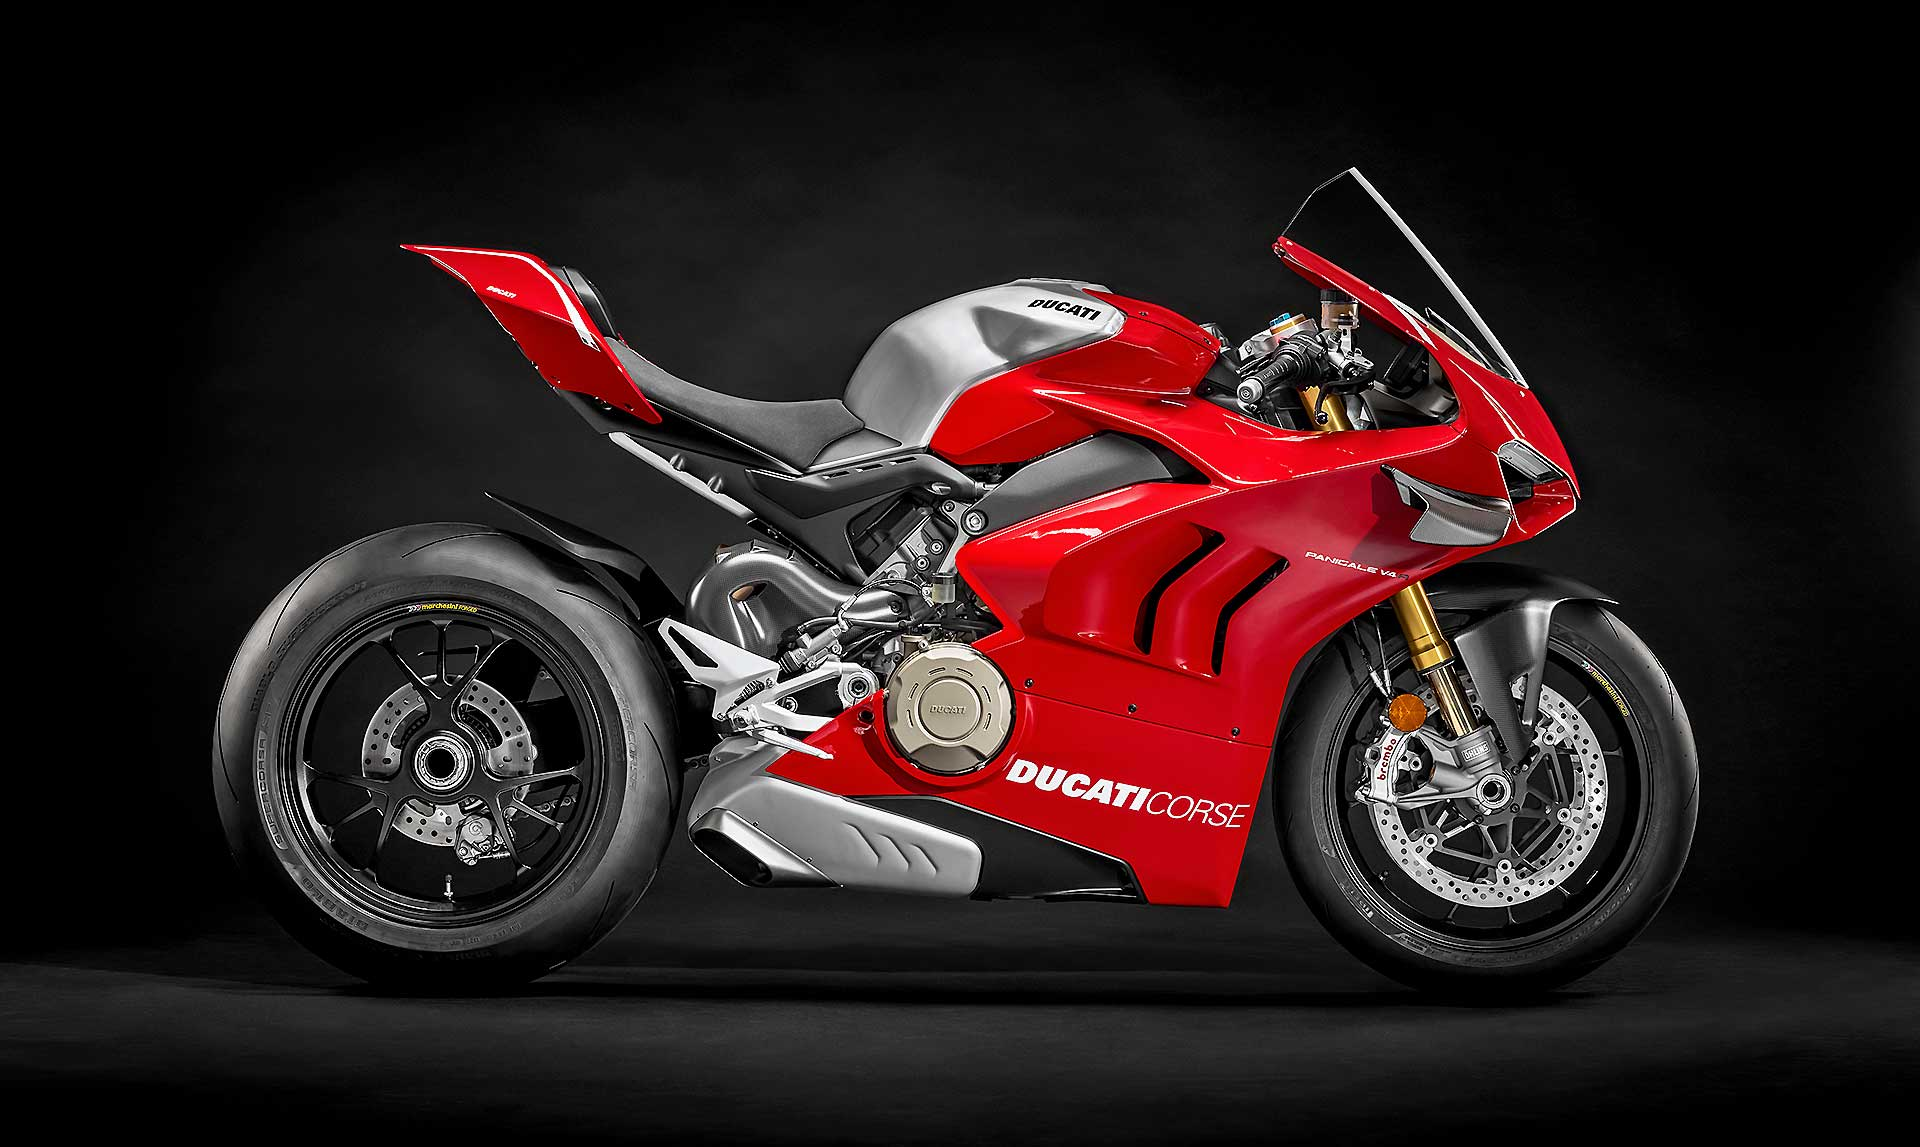 Ducati-Panigale-V4R-001.jpg